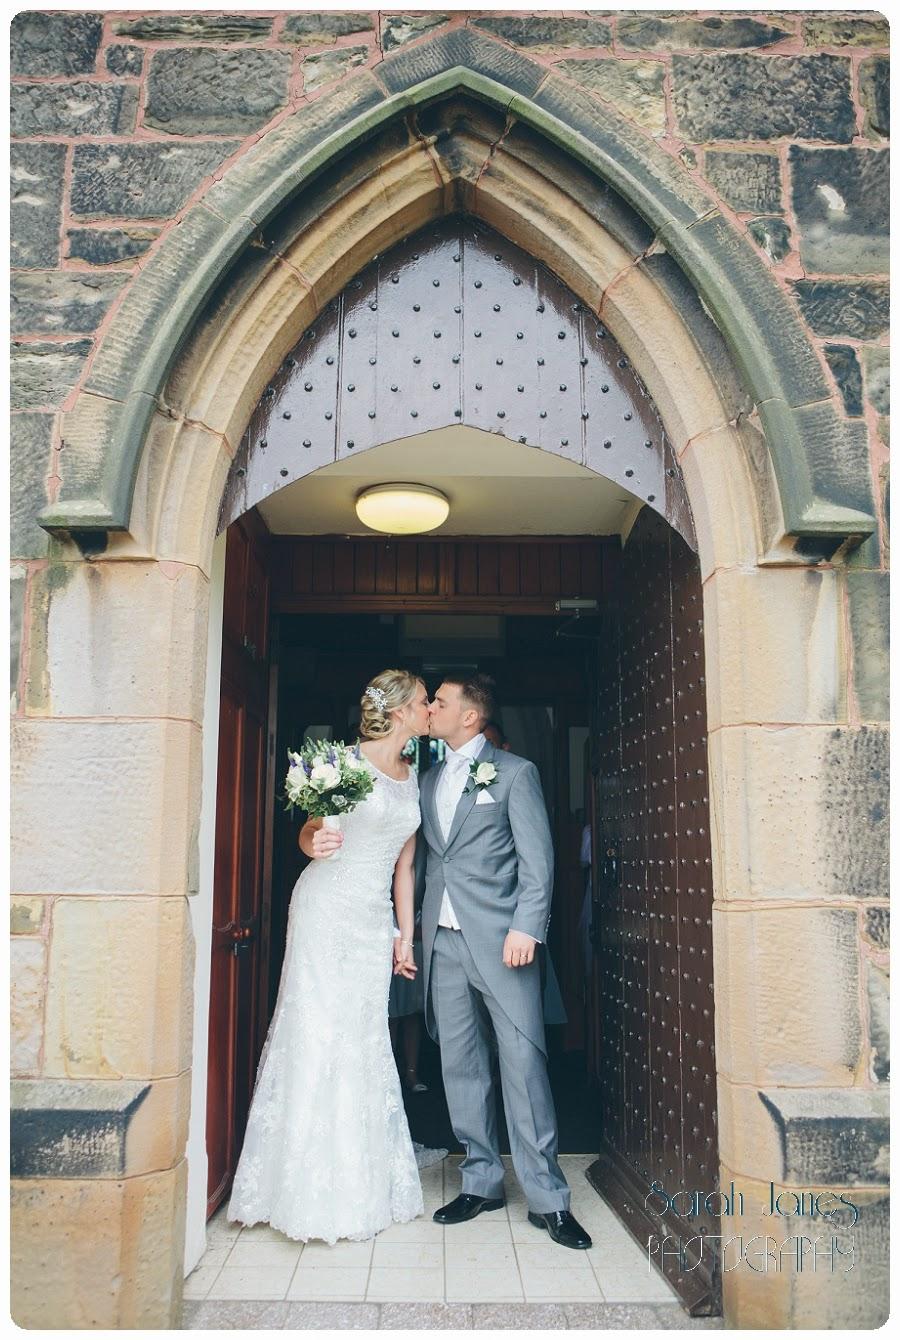 Sarah+Janes+photography,+wedding+photography,barn+wedding+north+wales_0013.jpg